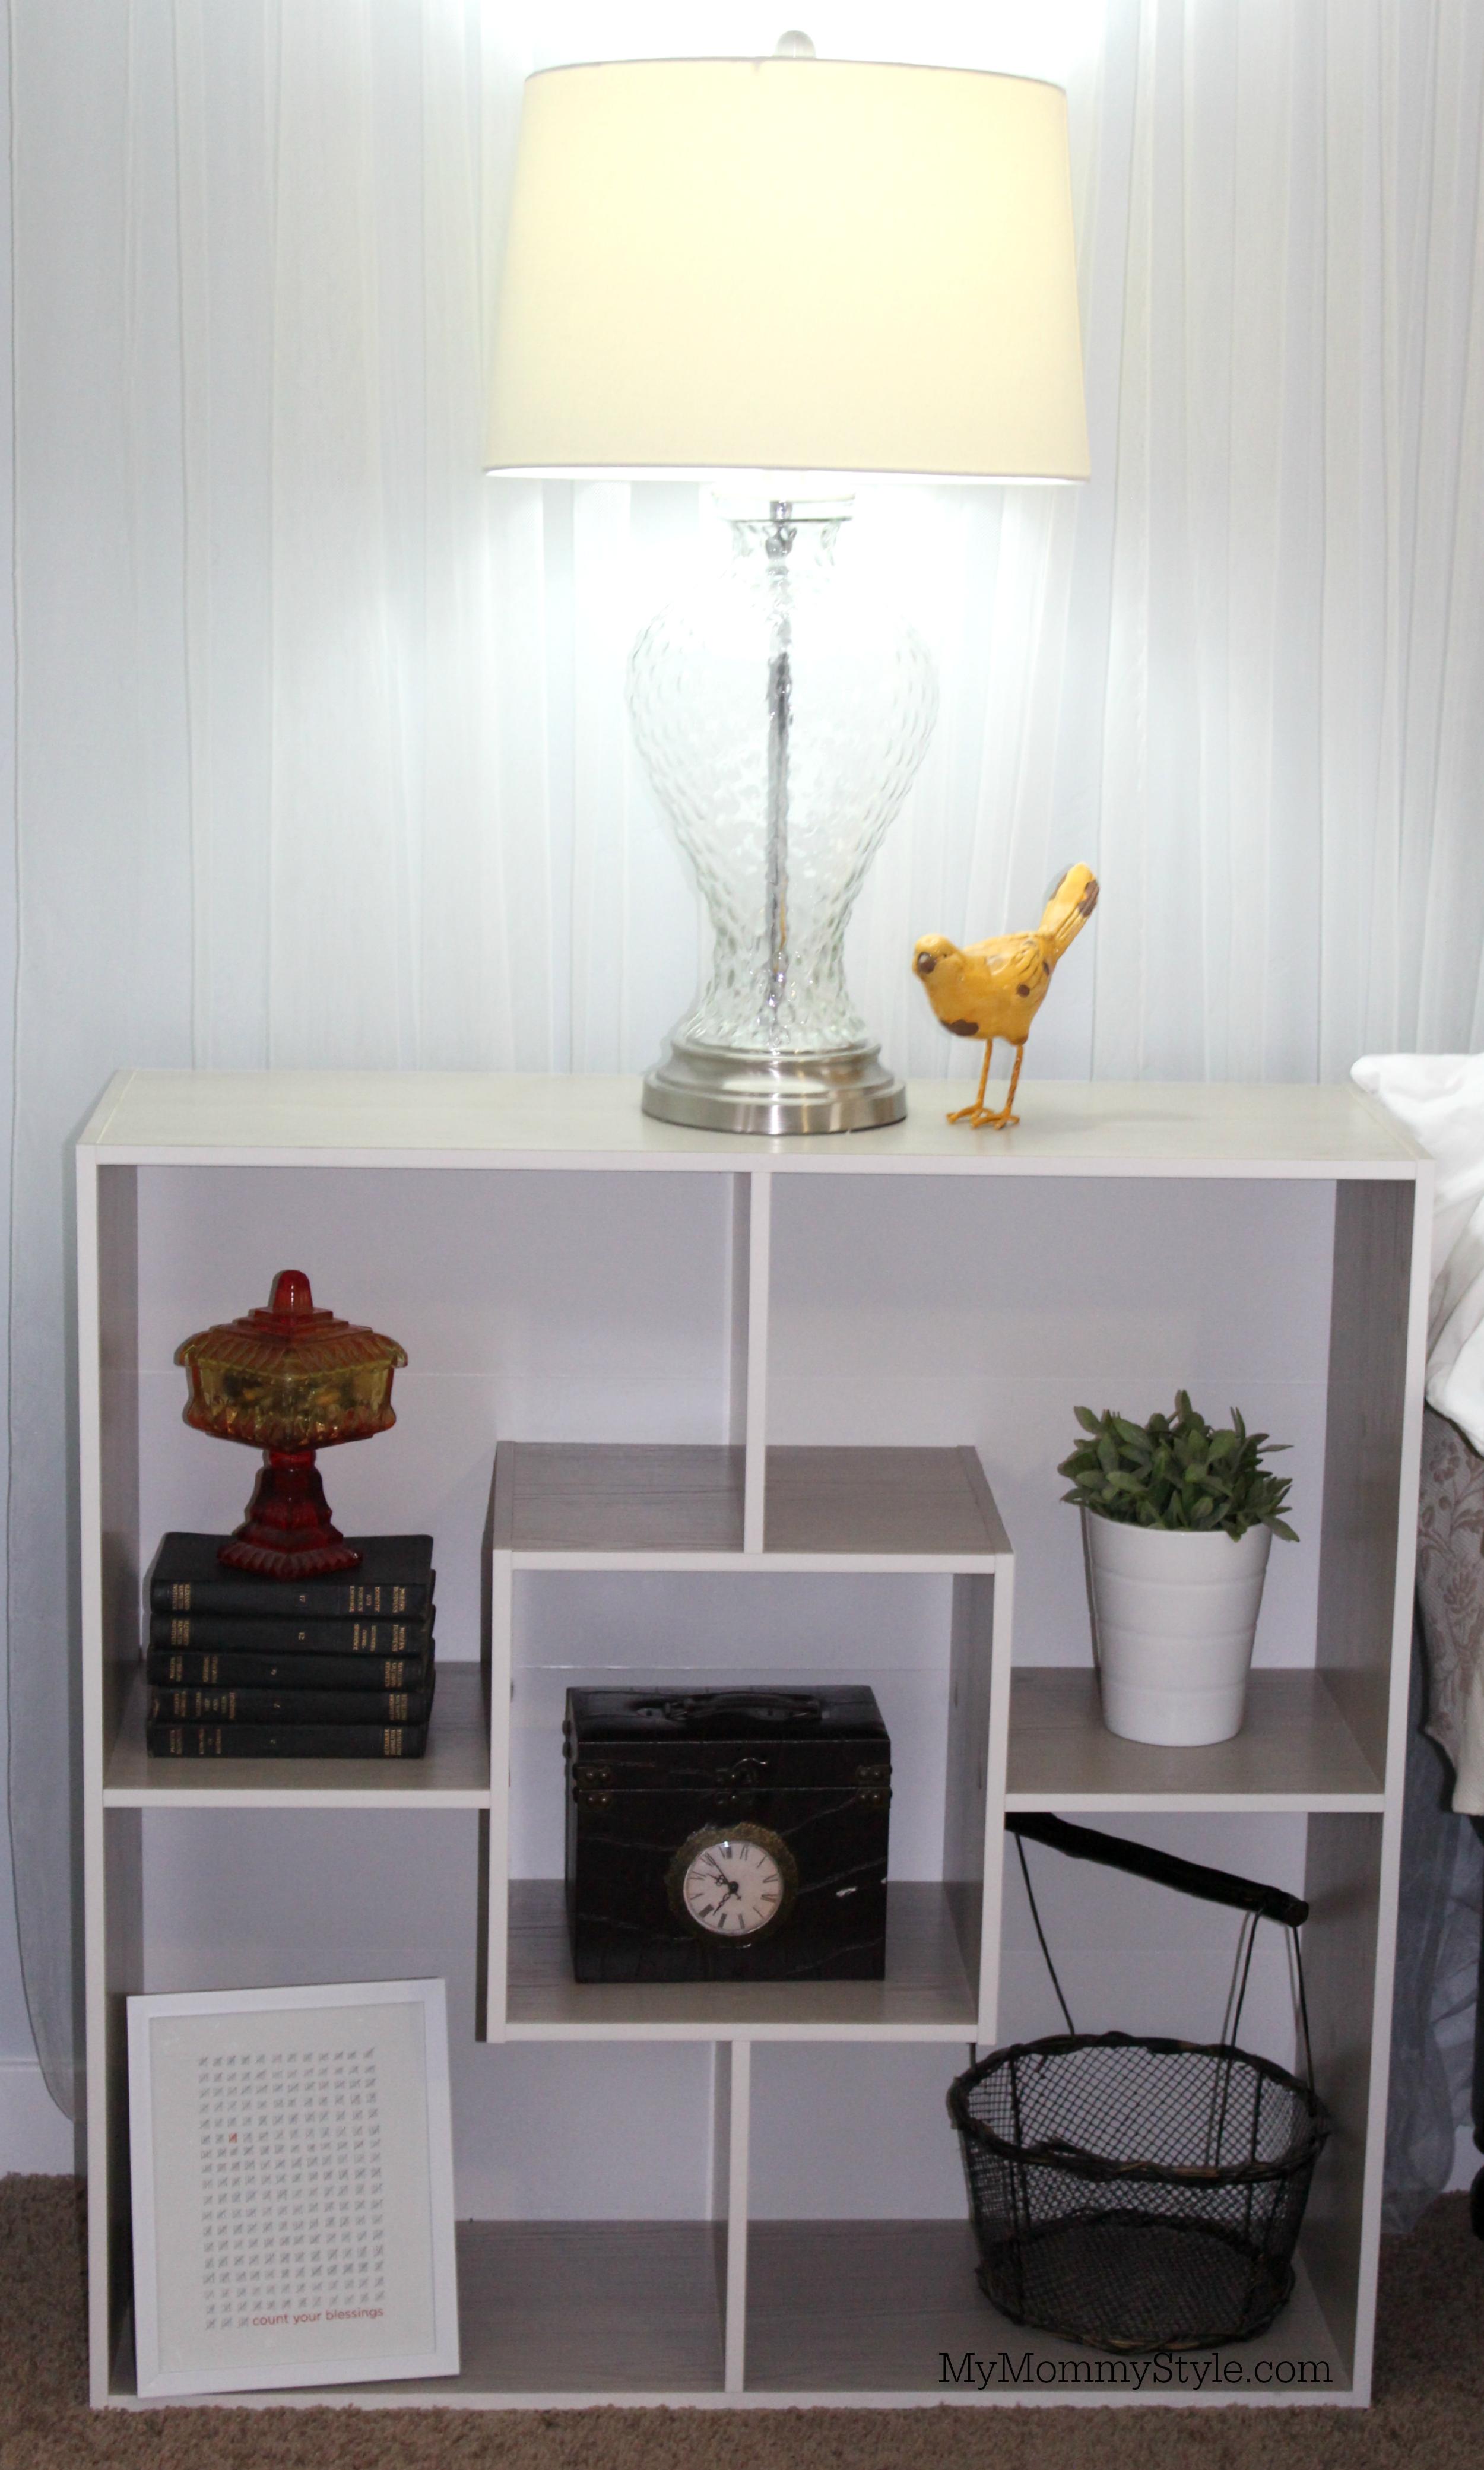 Sauder furniture, side tables, master bedroom, My Mommy Style, bookshelf